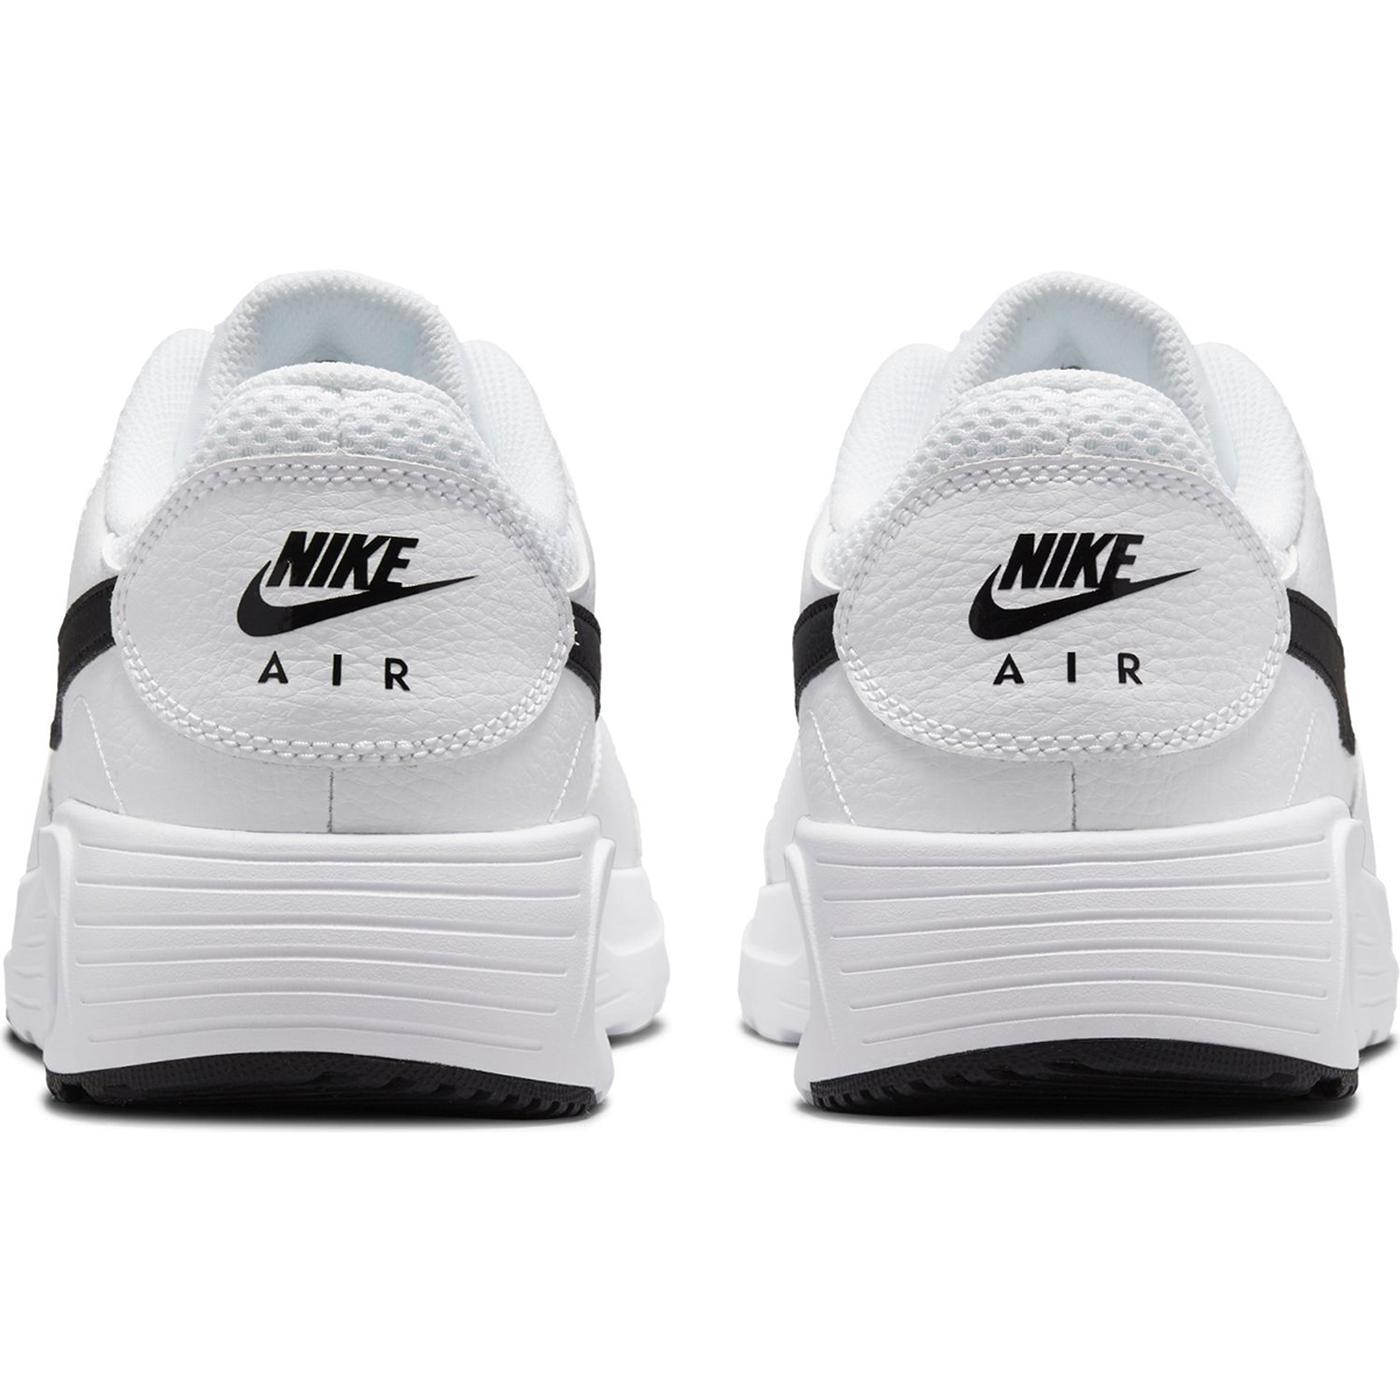 Air Max Sc Erkek Beyaz Spor Ayakkabı (CW4555-102)